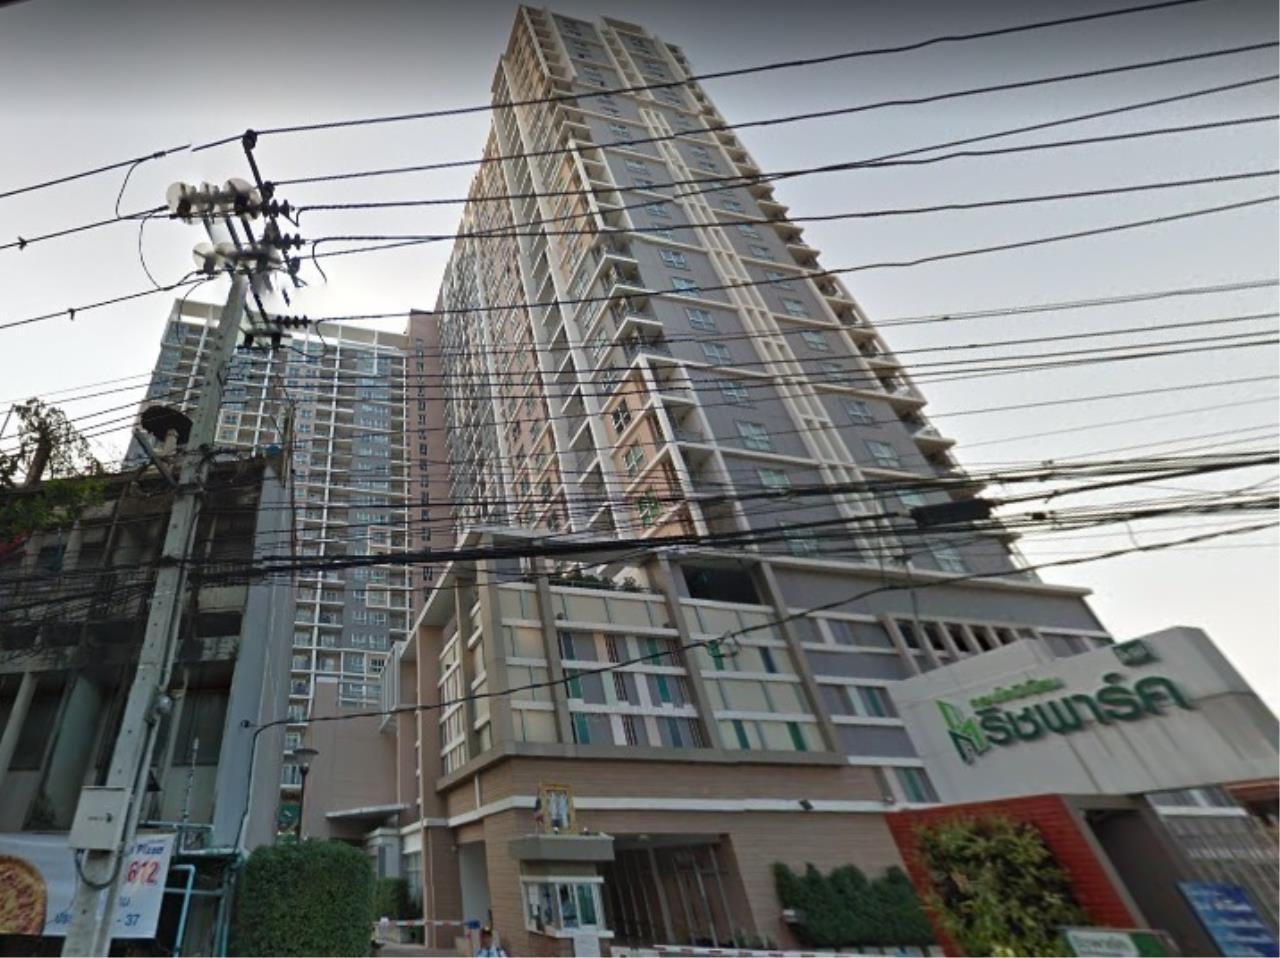 richpark bangson station condo bangkok 59e9a04ca12eda70d0000074_full